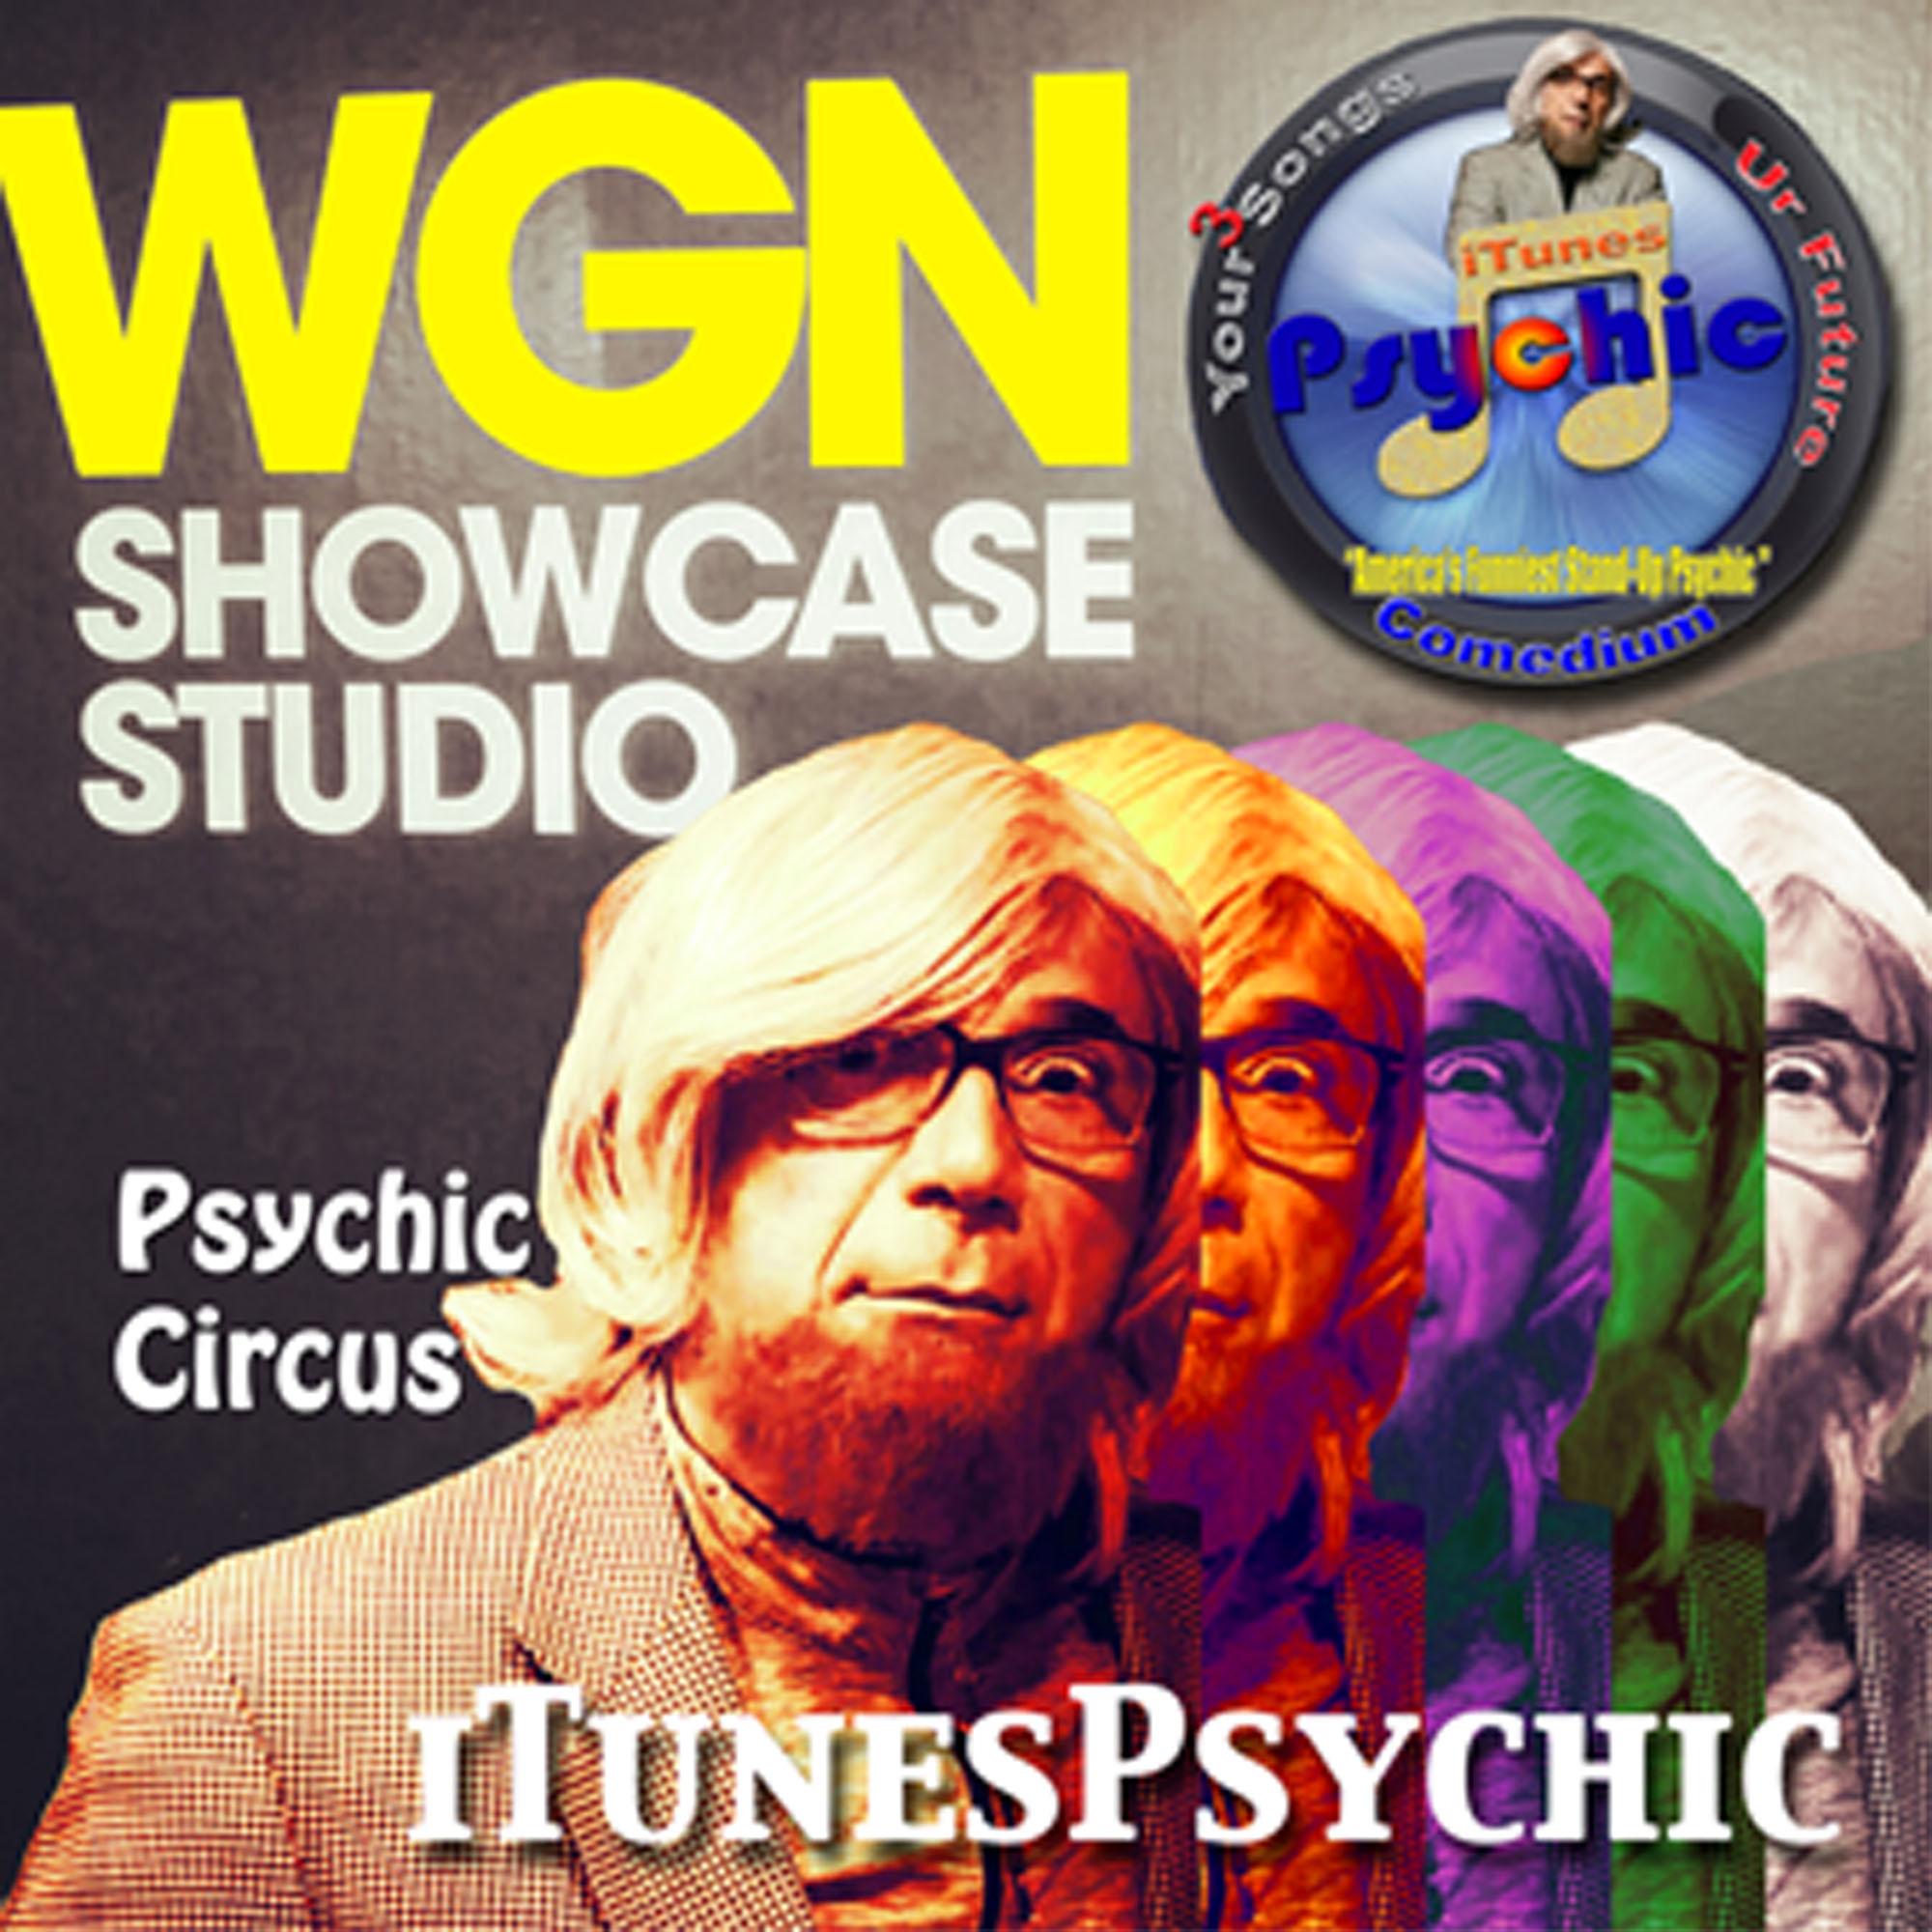 Psychic Circus: ERICA does PORNSTAR PR, SHANNON CALLS BACK  26 min 2017-09-18